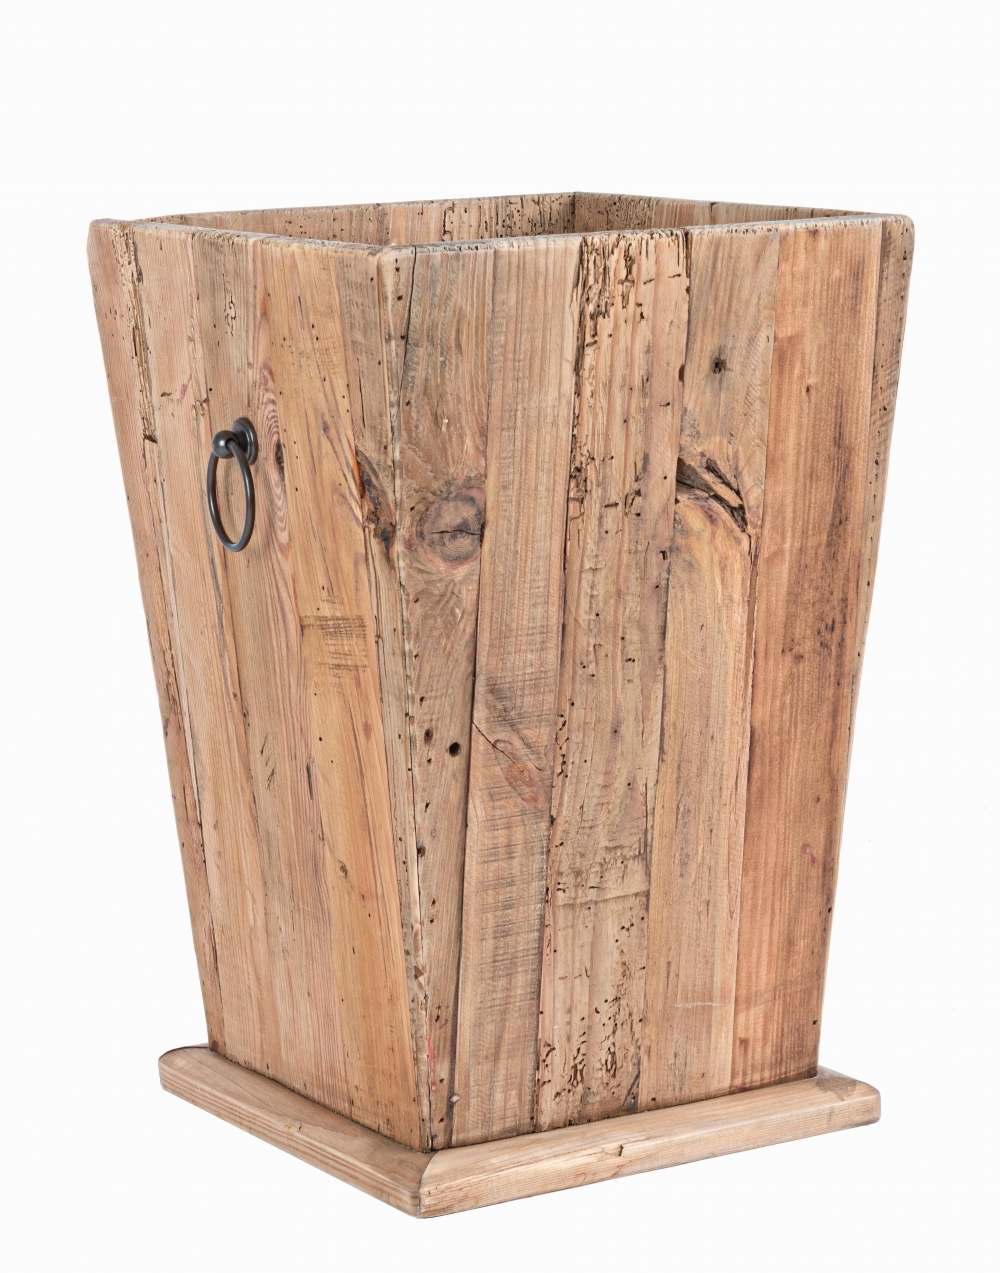 Suport ghiveci din lemn reciclat Ellison H60cm imagine 2021 insignis.ro